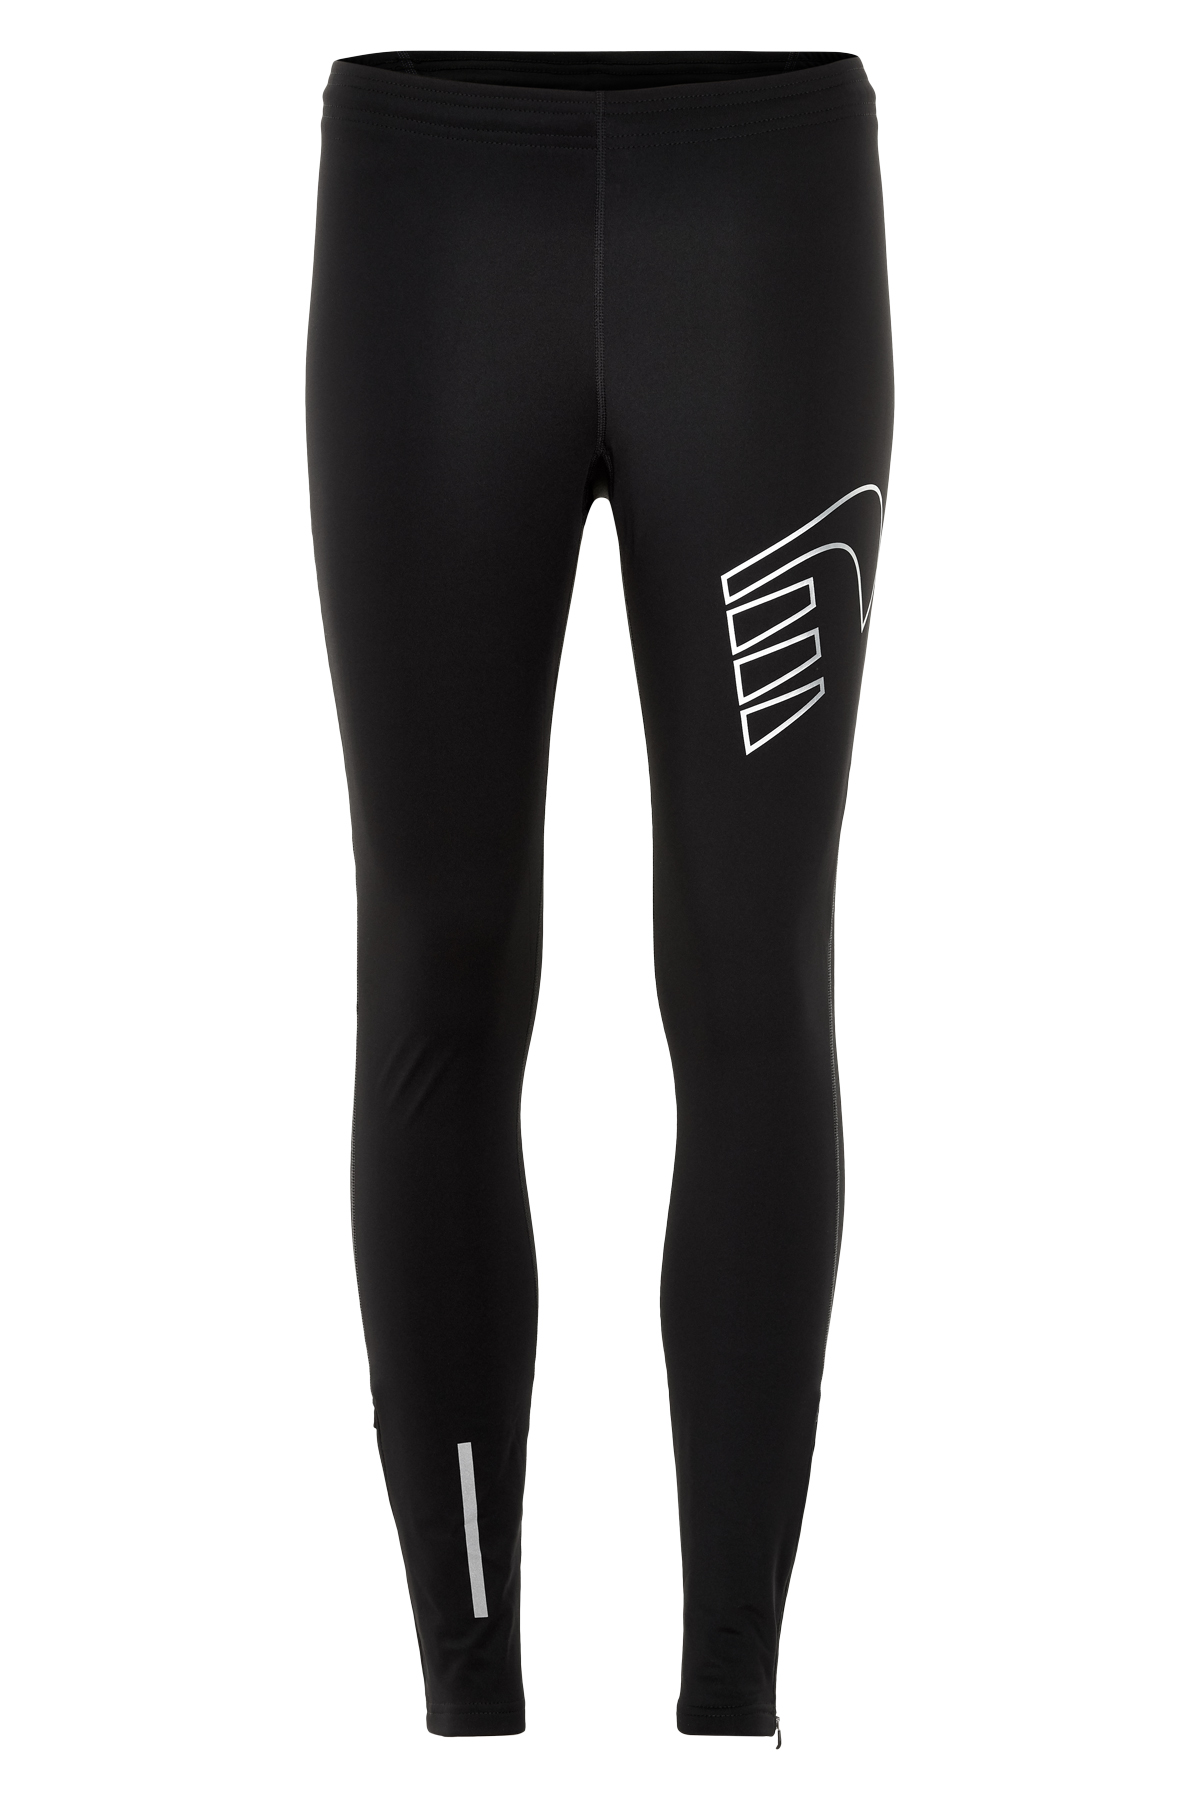 Newline Core Warm Protect tights